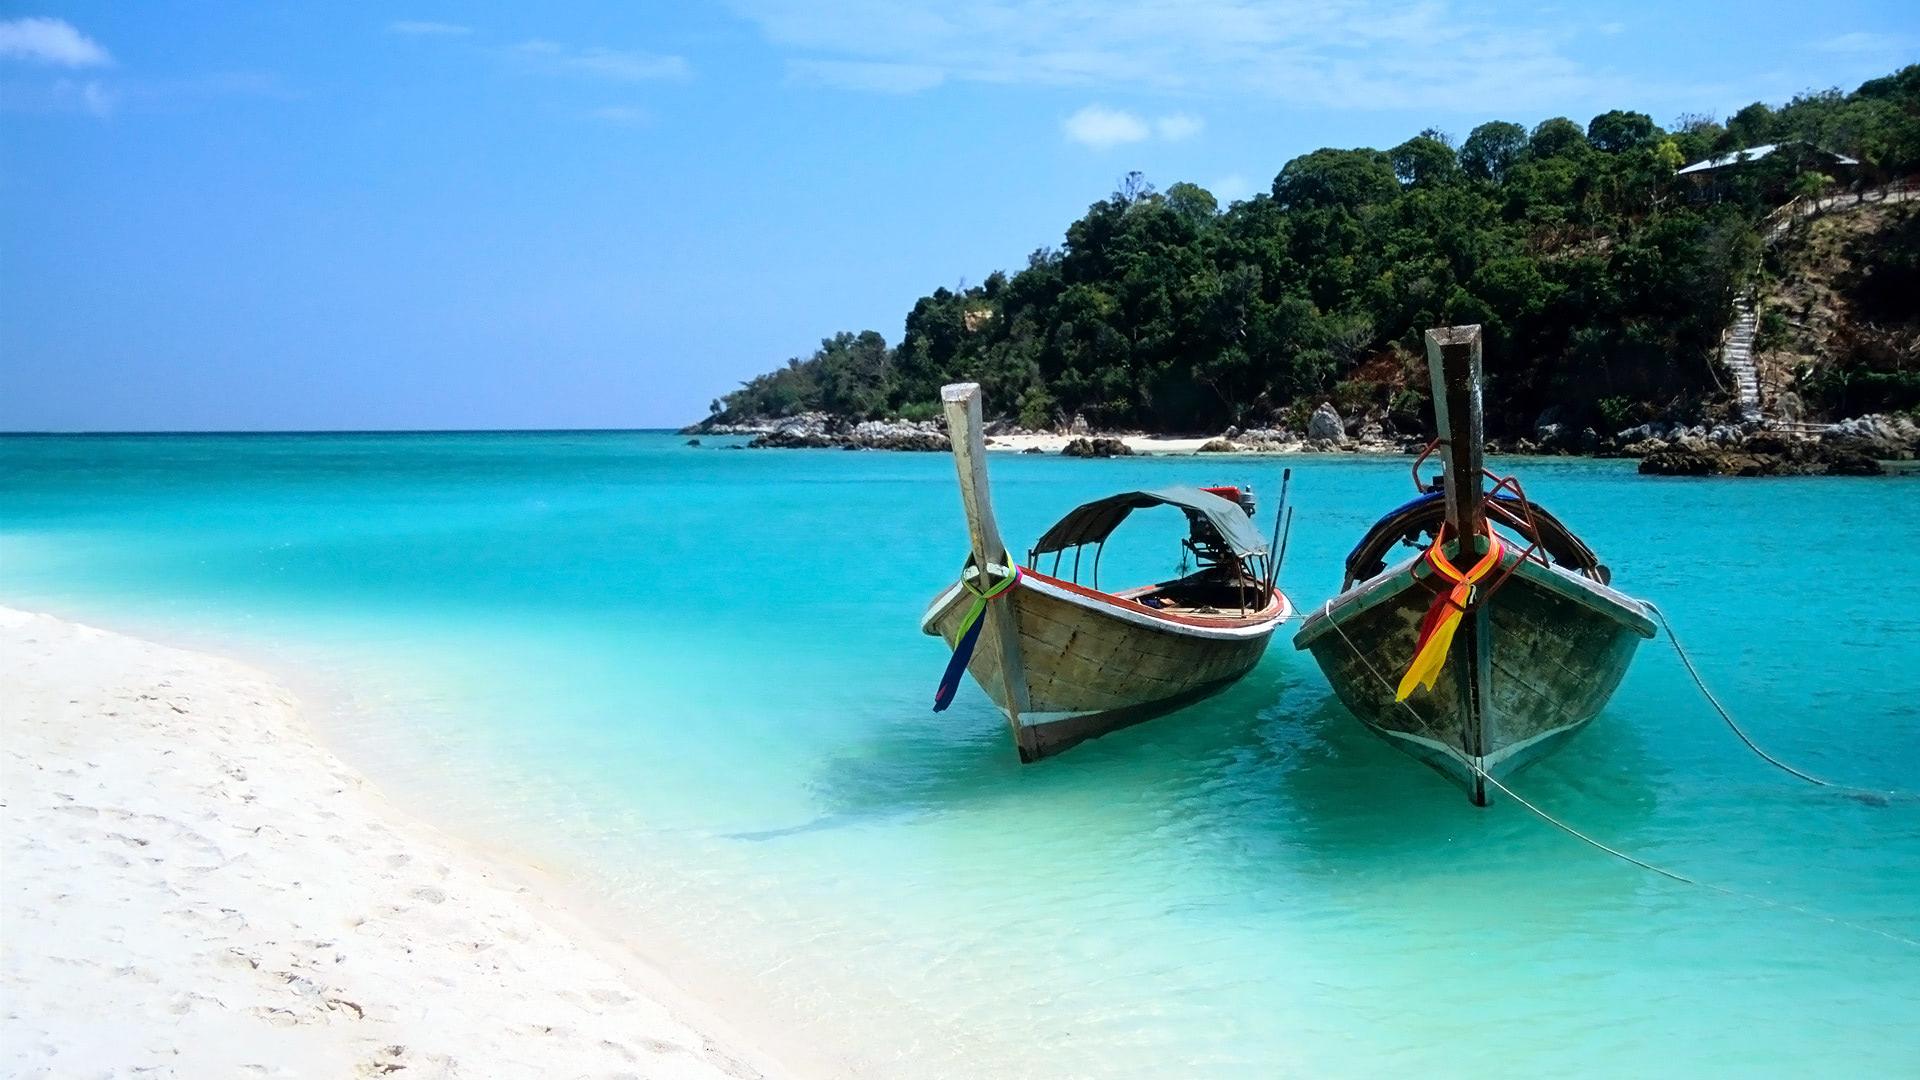 Two Boats On The Beach Of Ko Lipe Island Wallpaper